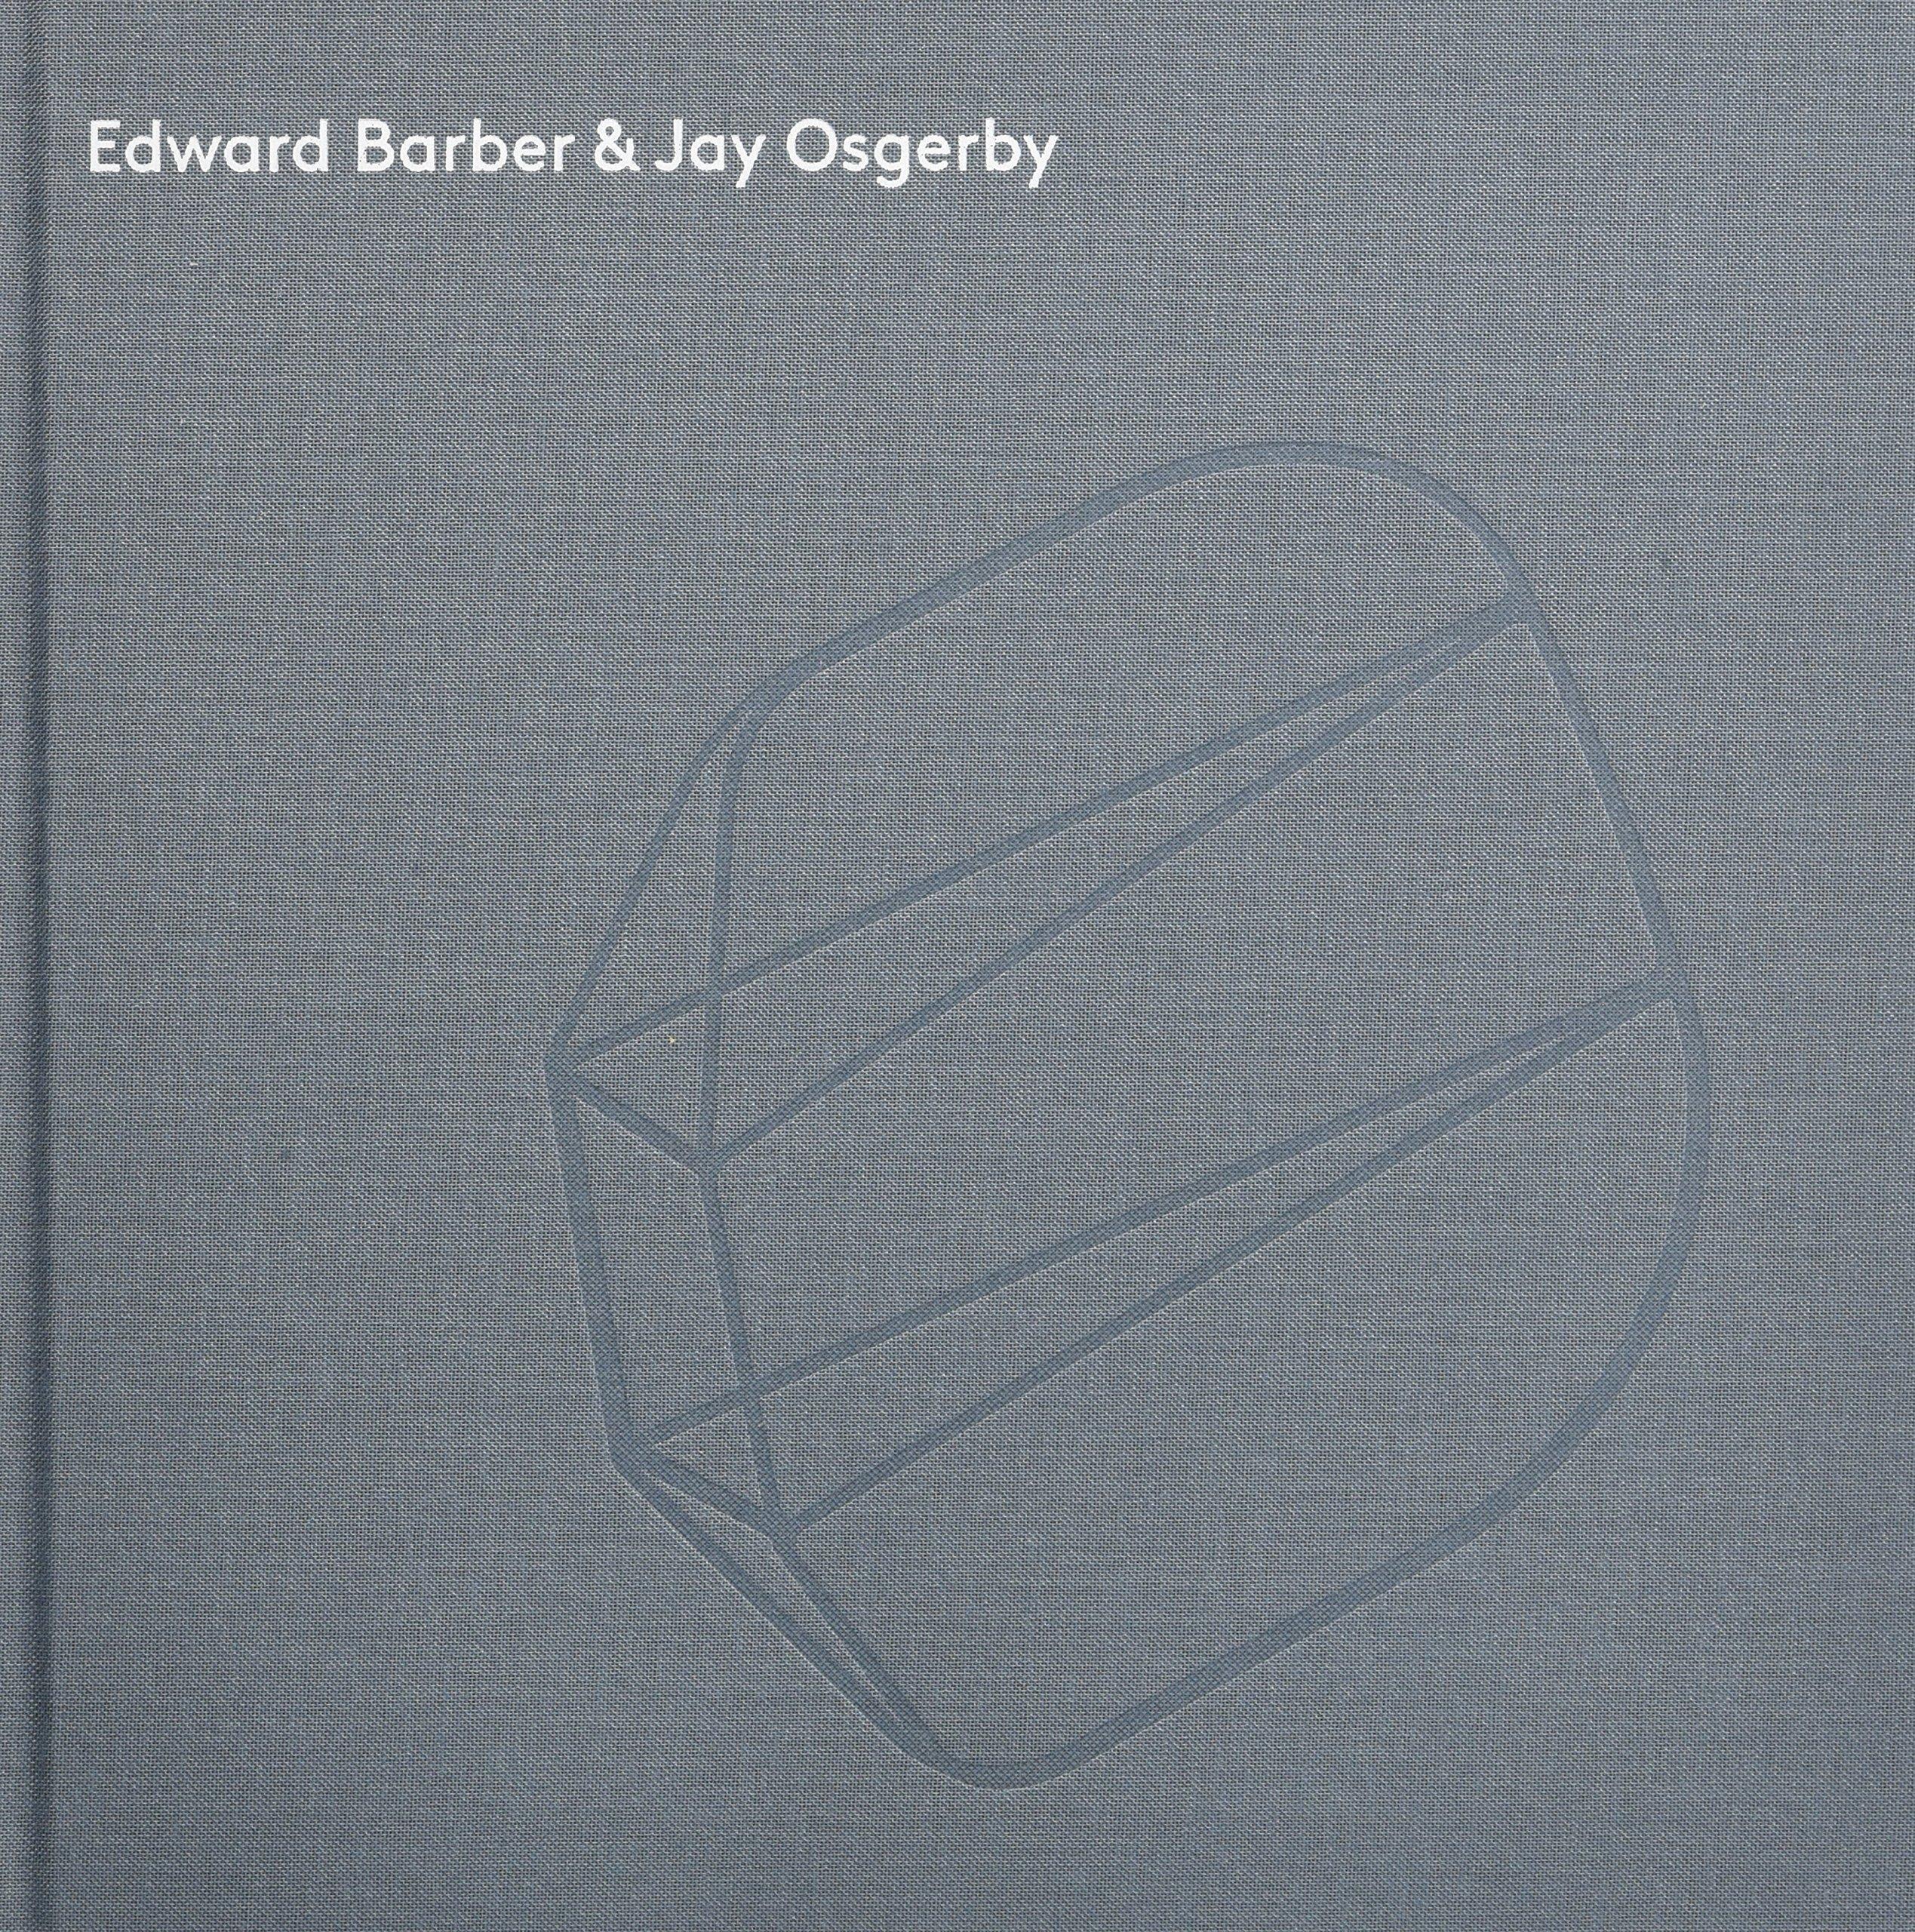 Edward Barber & Jay Osgerby: Ascent